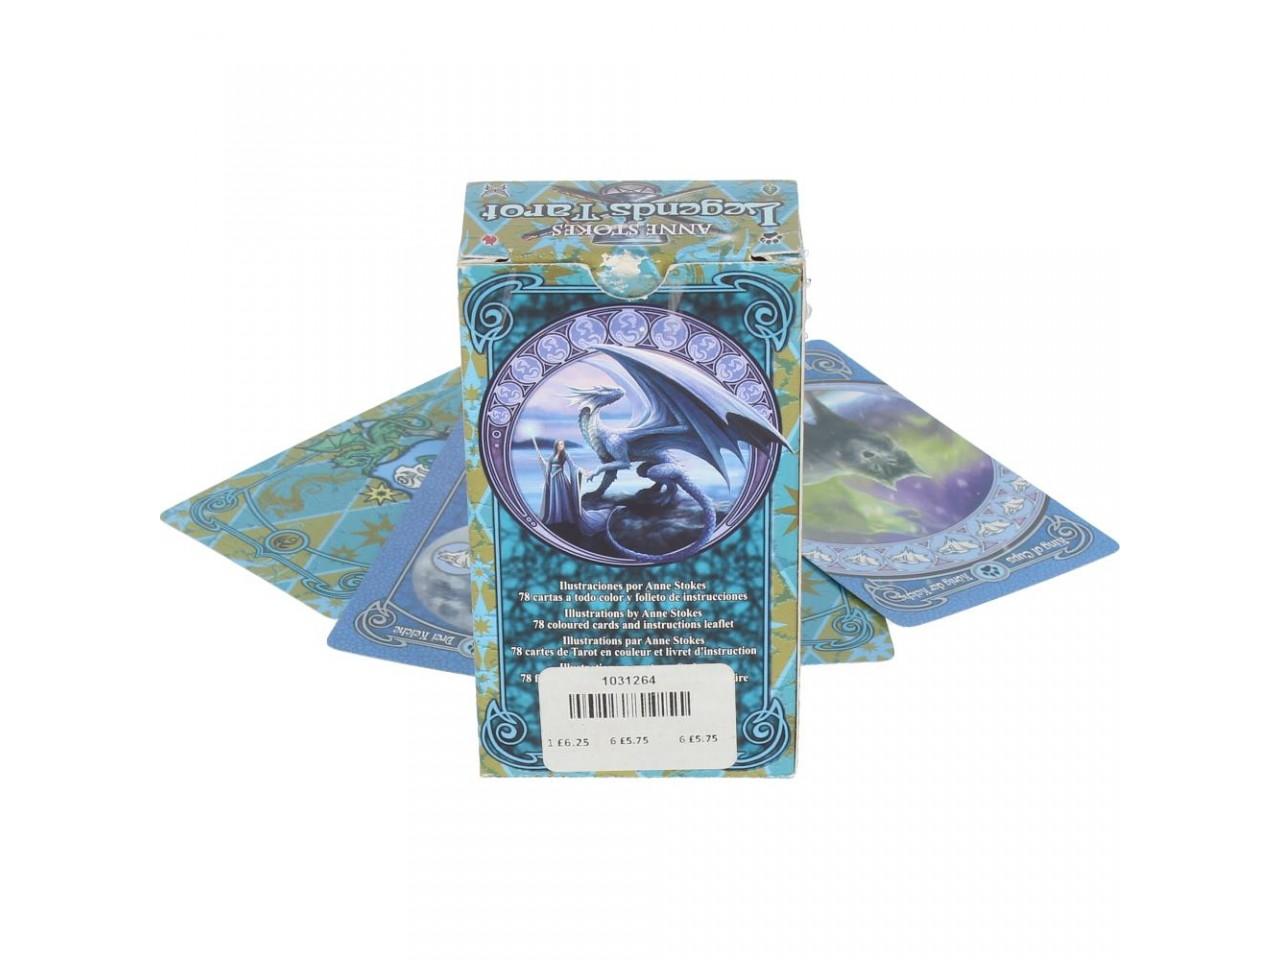 Nemesis Now Anne Stokes Legends Fantasy Tarot Cards